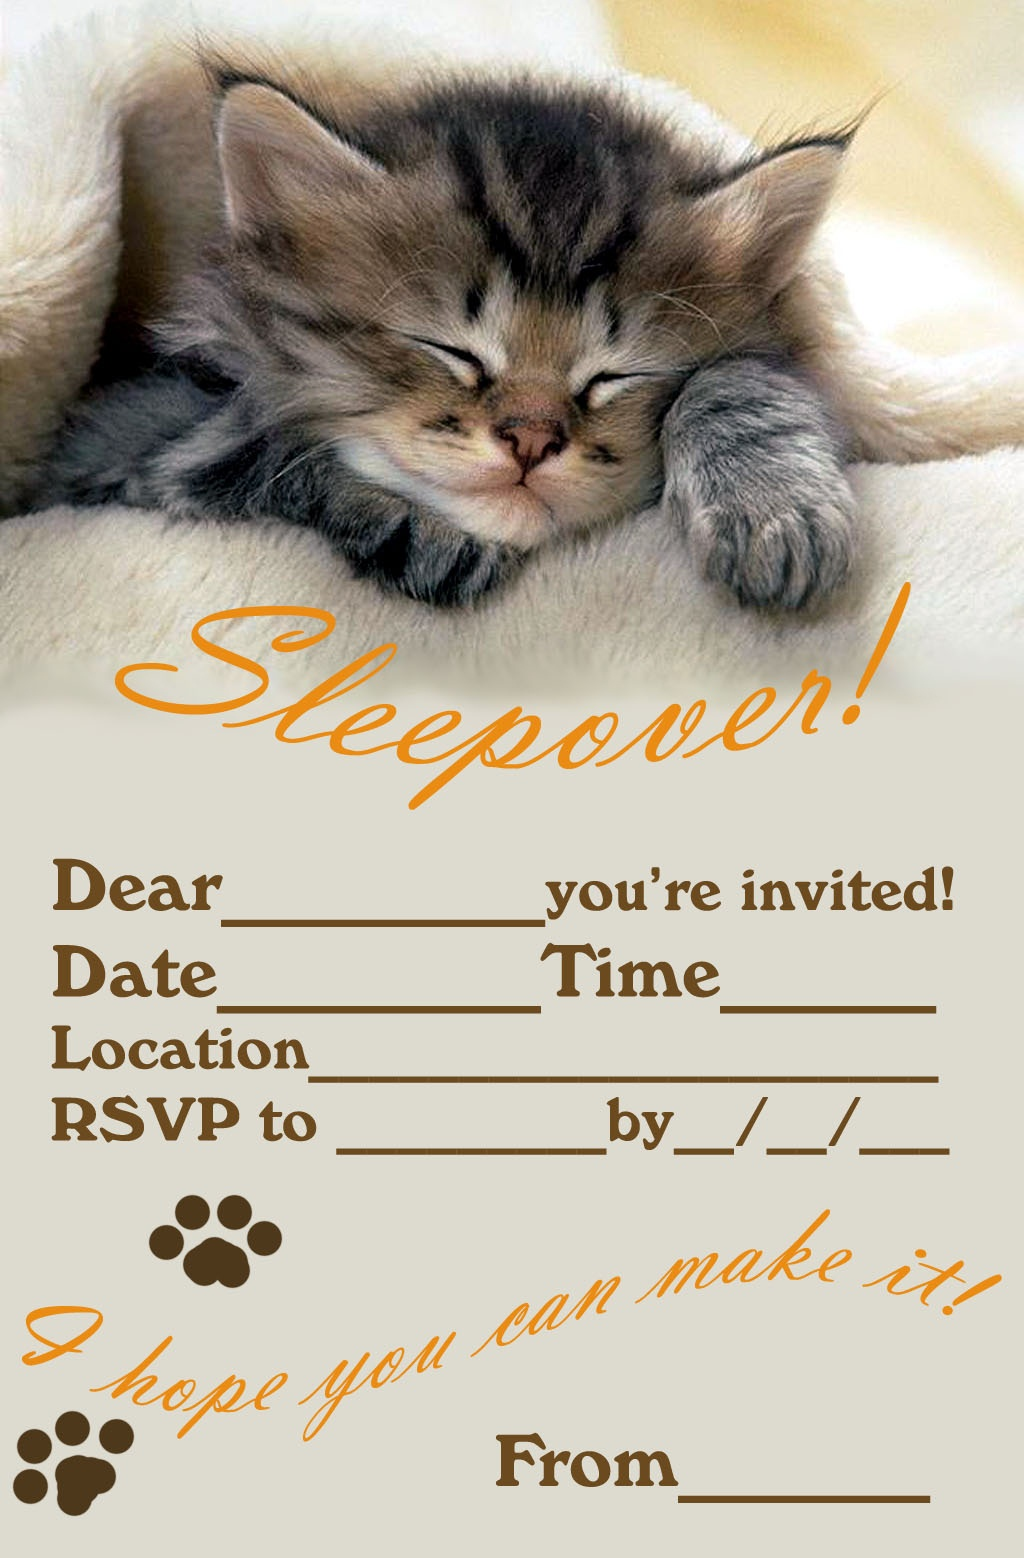 50 Beautiful Slumber Party Invitations | Kittybabylove - Free Printable Kitten Birthday Invitations